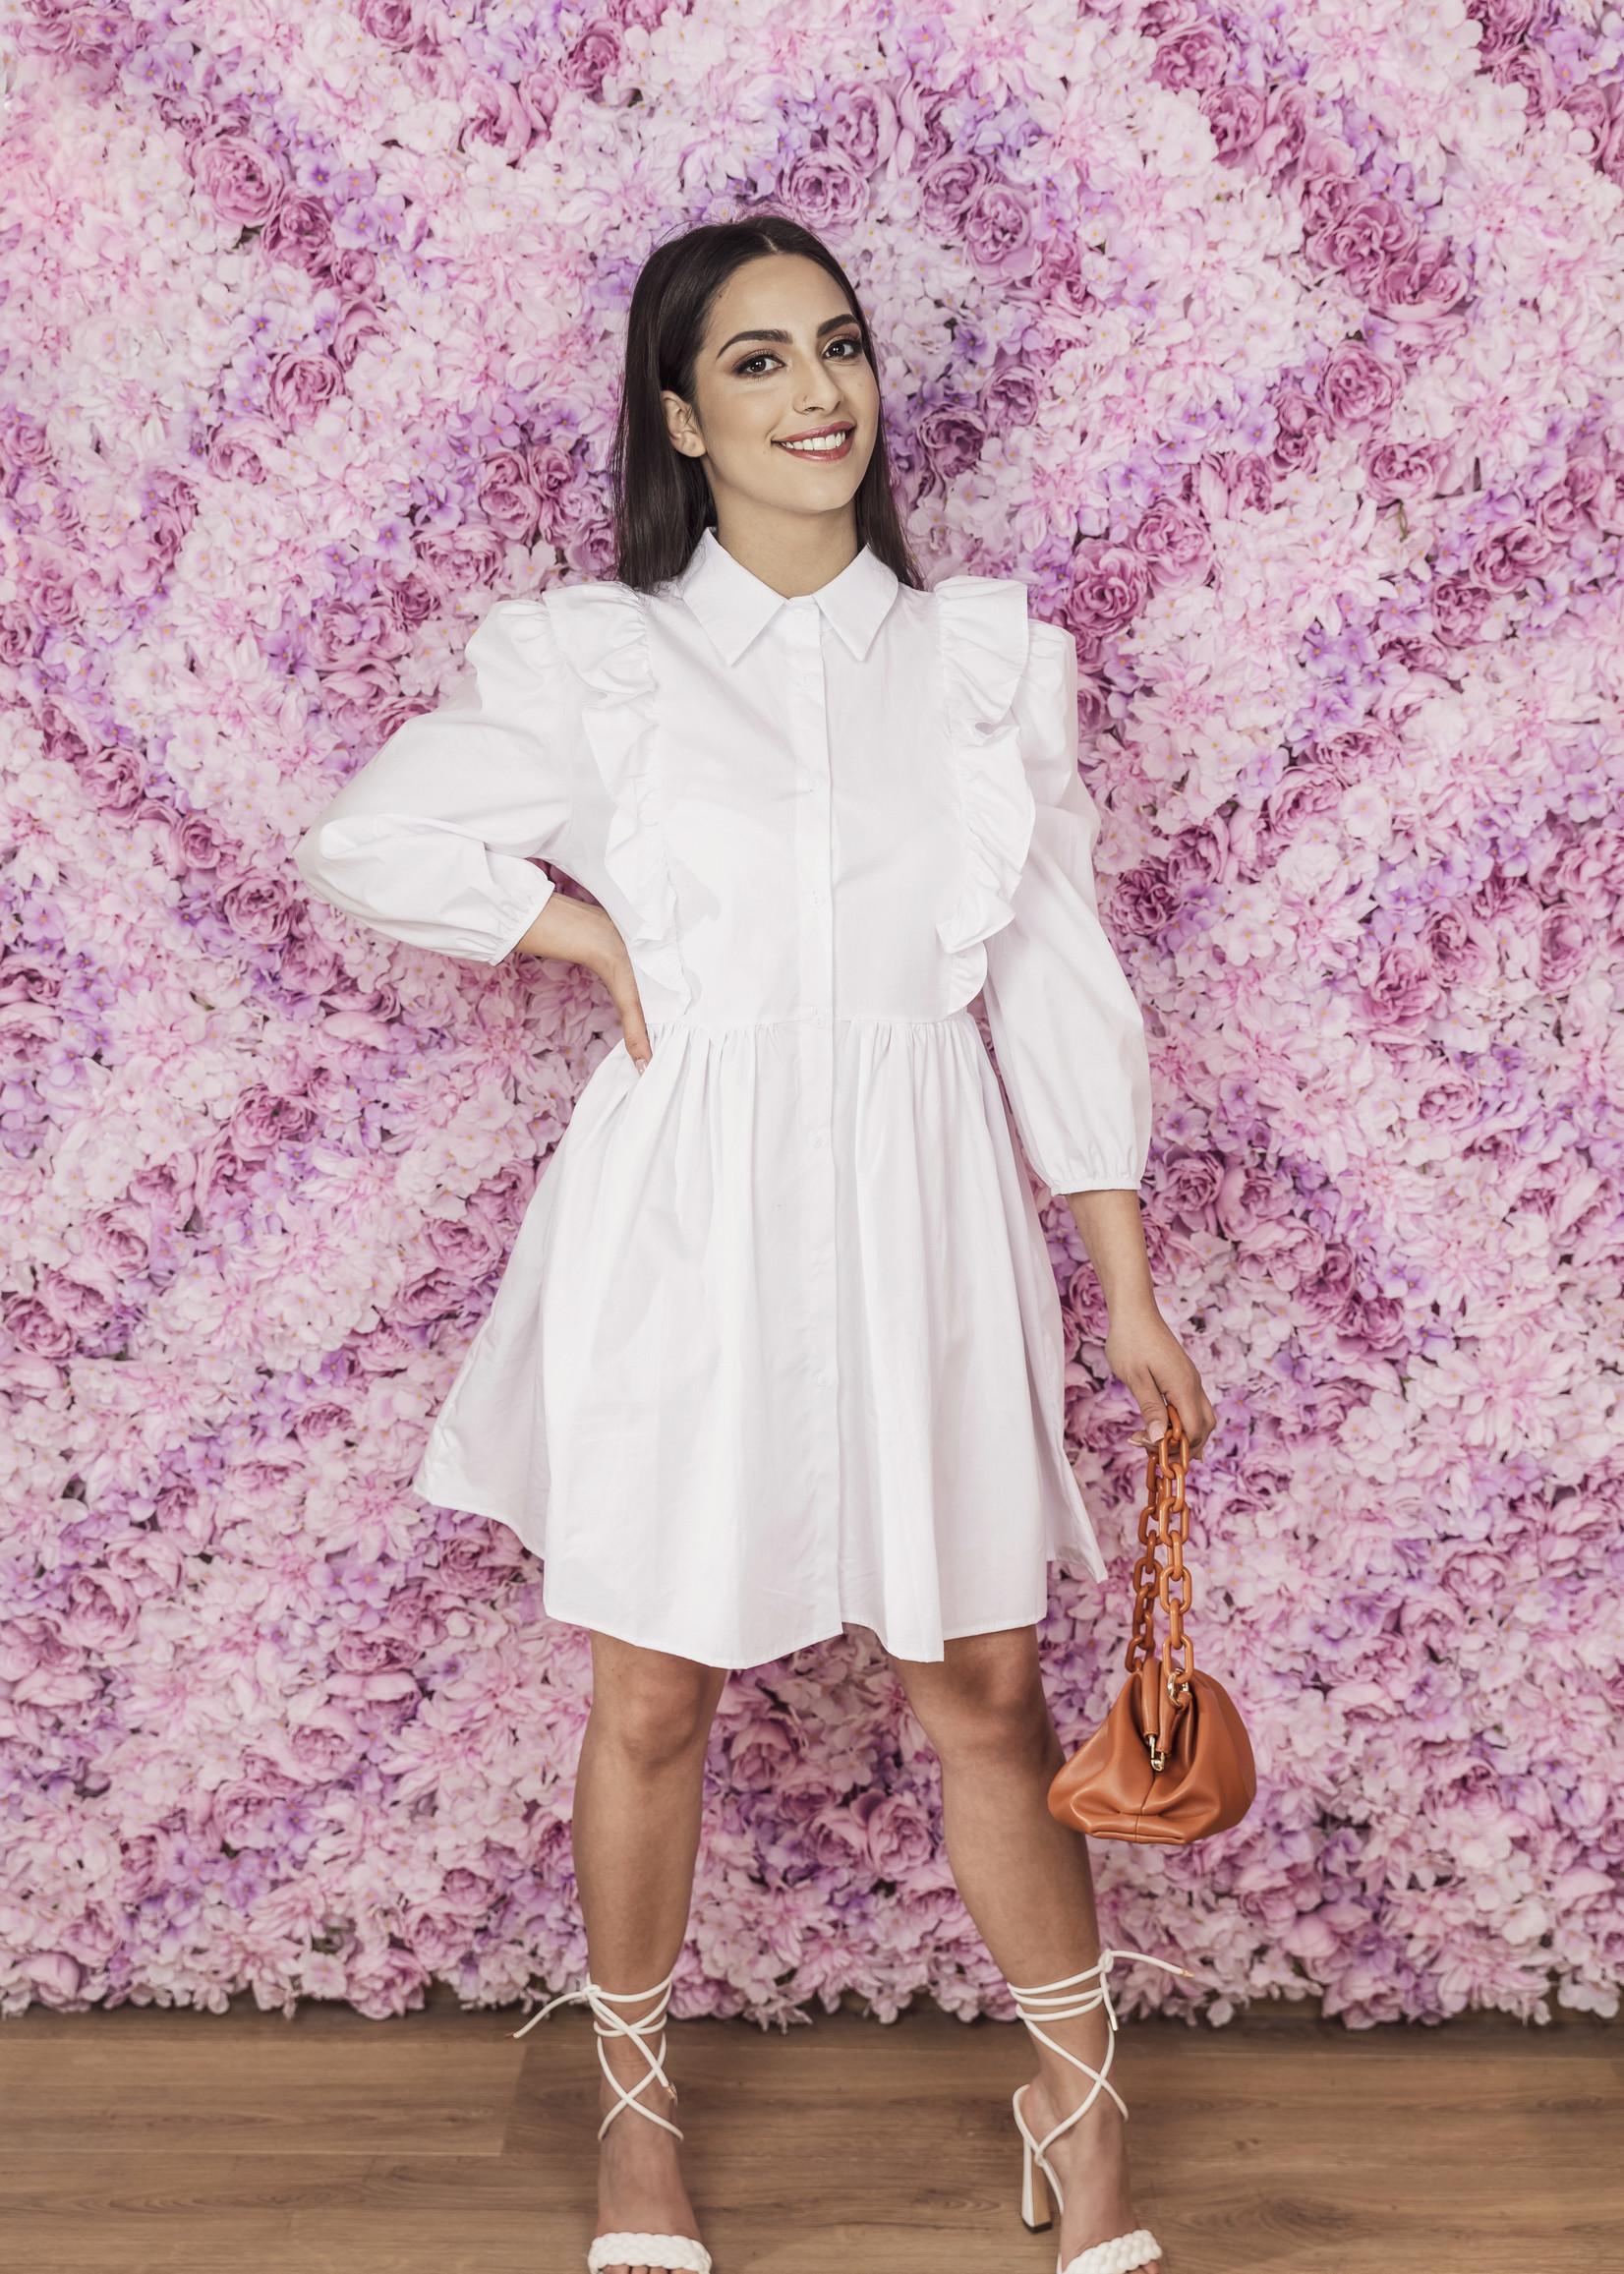 Luzabelle hemdkleedje white